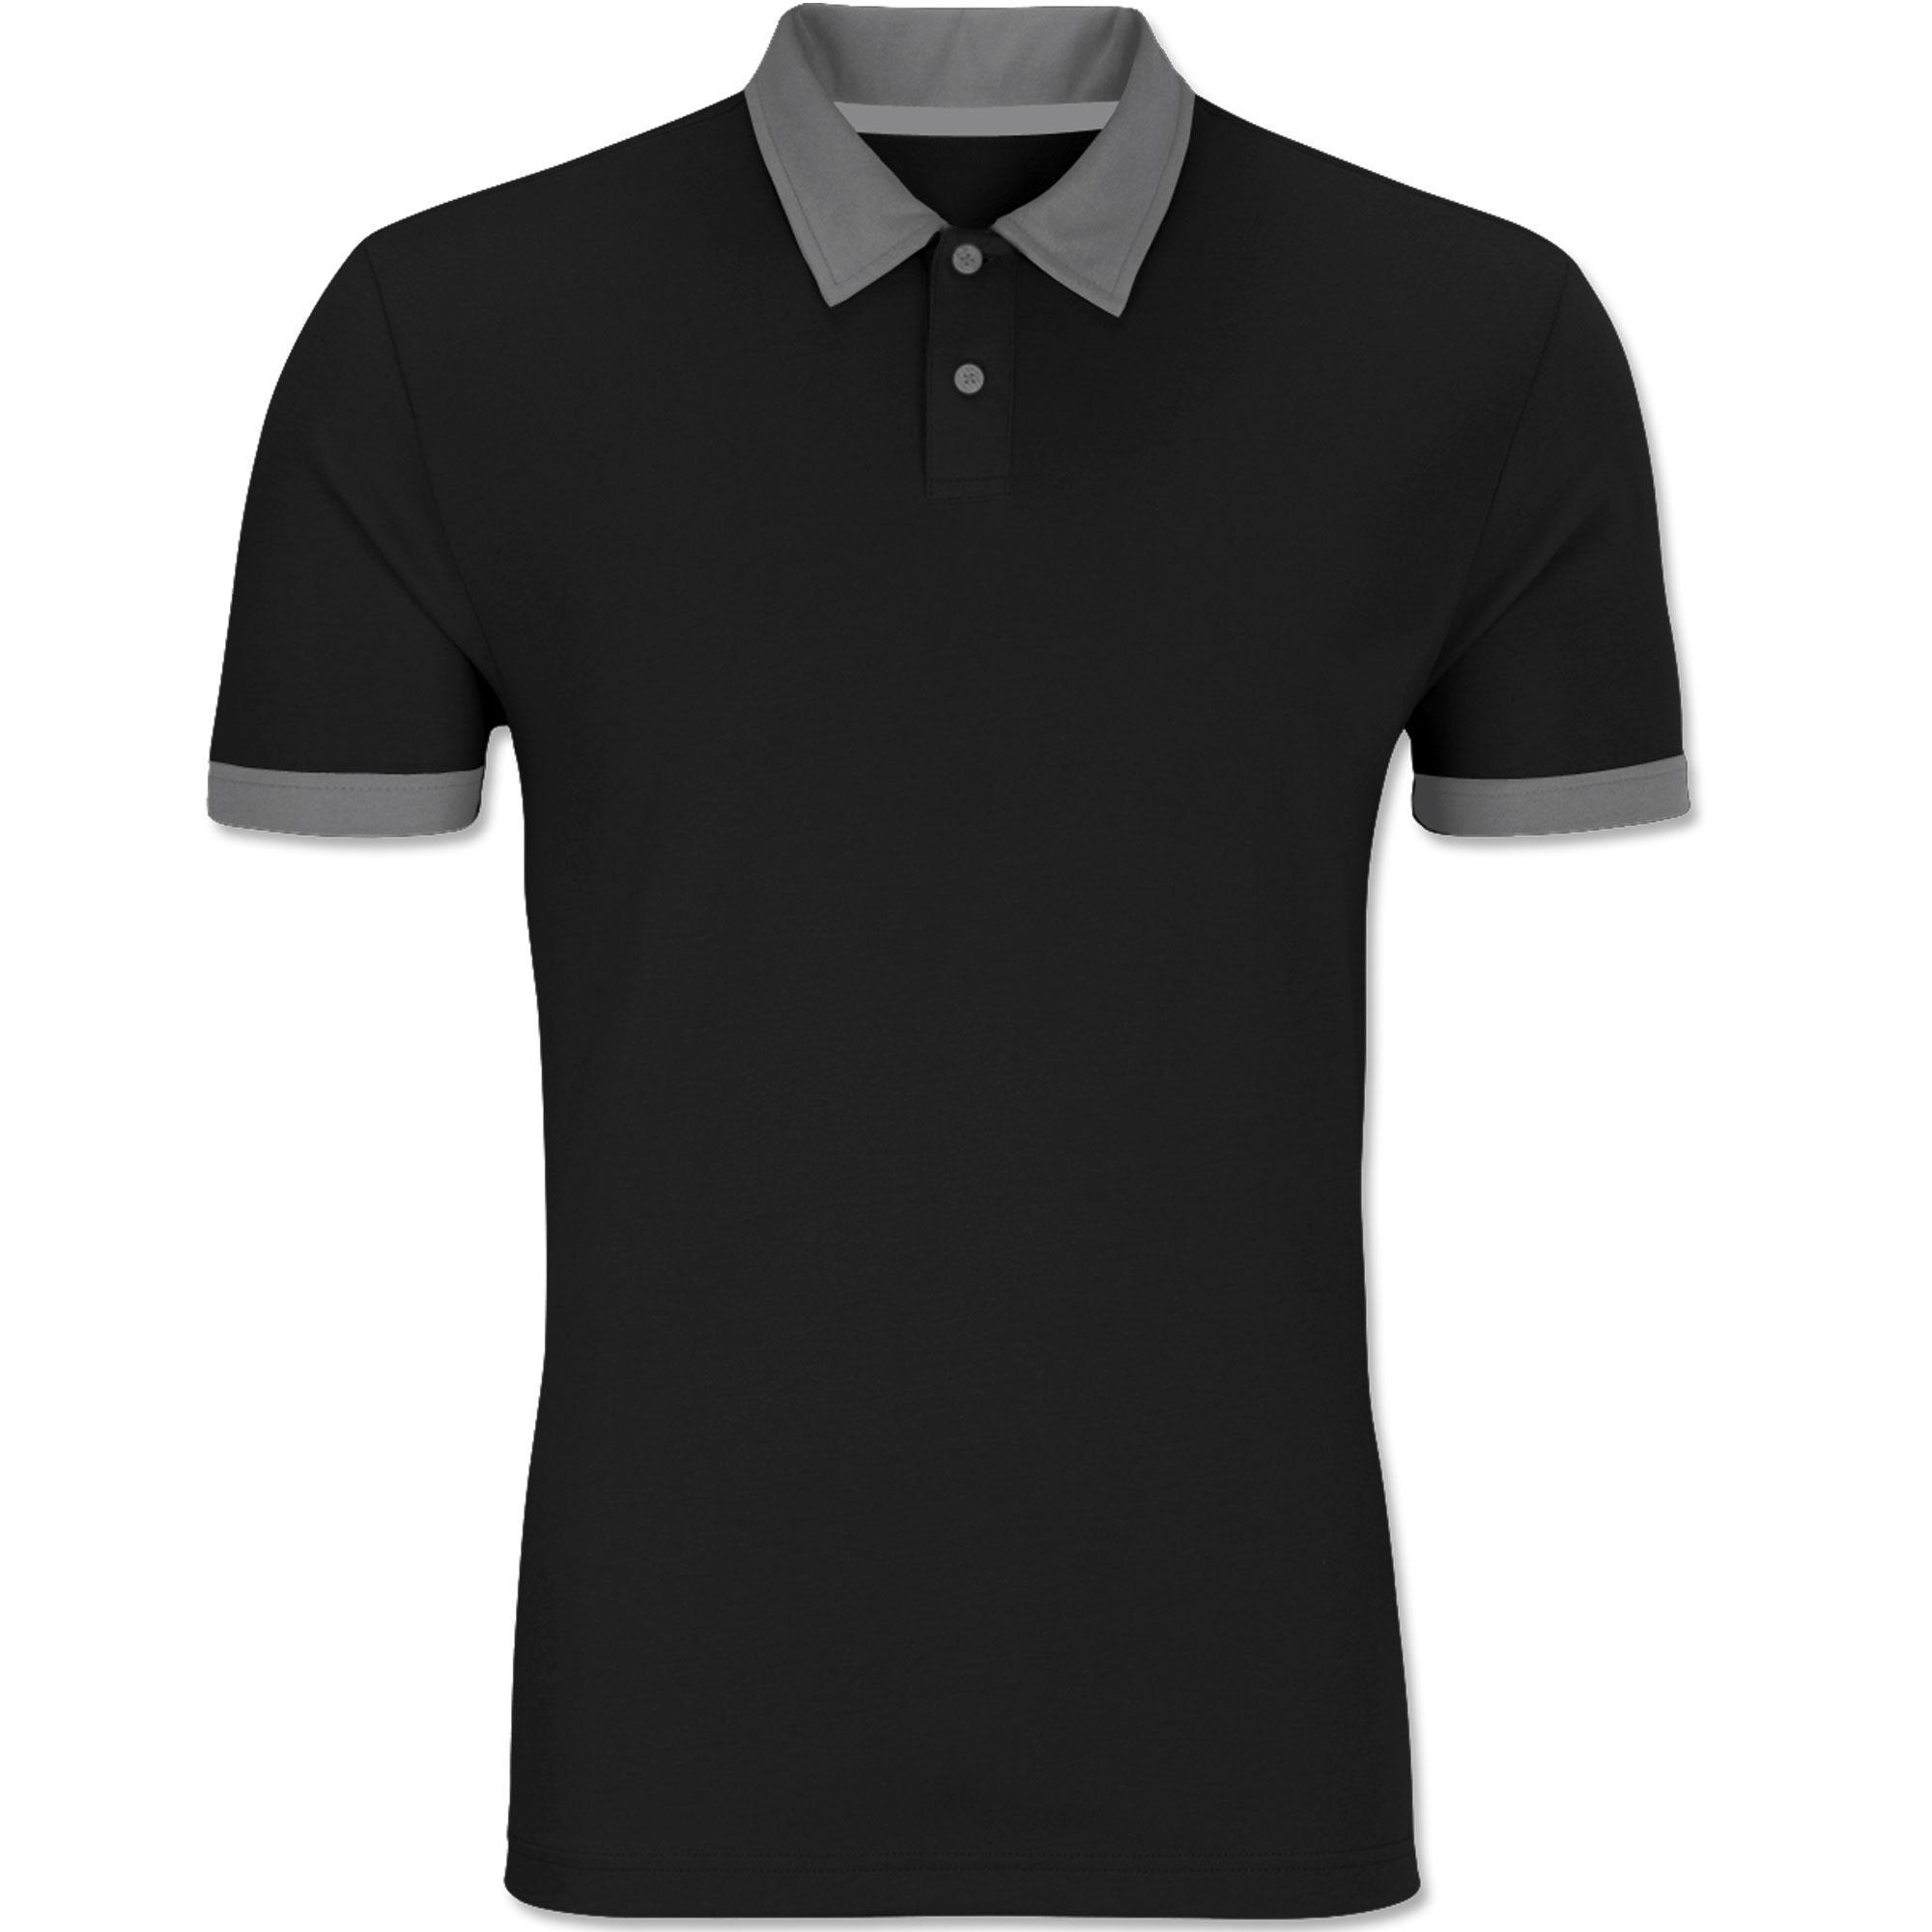 Brutess Buy At Best Price In Bangladesh Sorban Long Black Shirt Sports Polo For Men